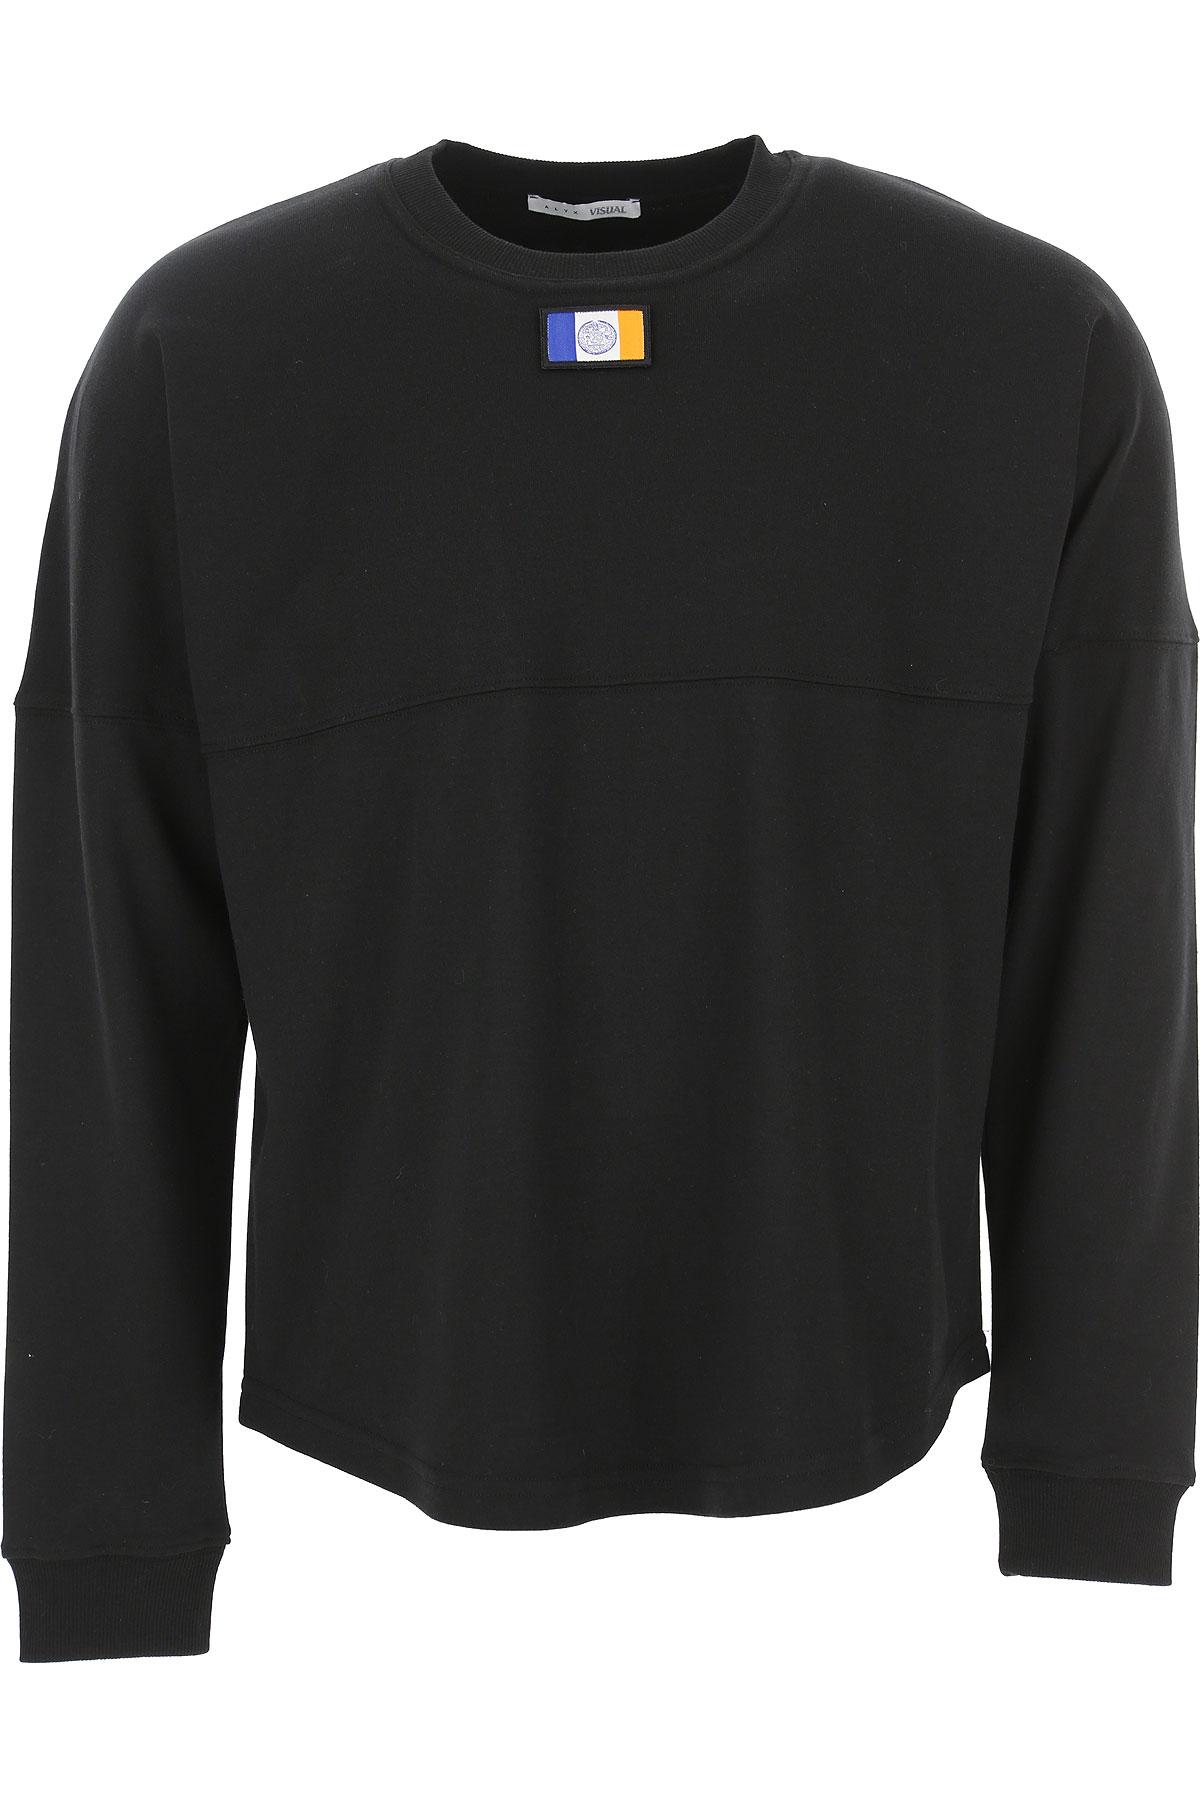 ALYX Sweatshirt for Men On Sale in Outlet, Black, Cotton, 2019, M XS